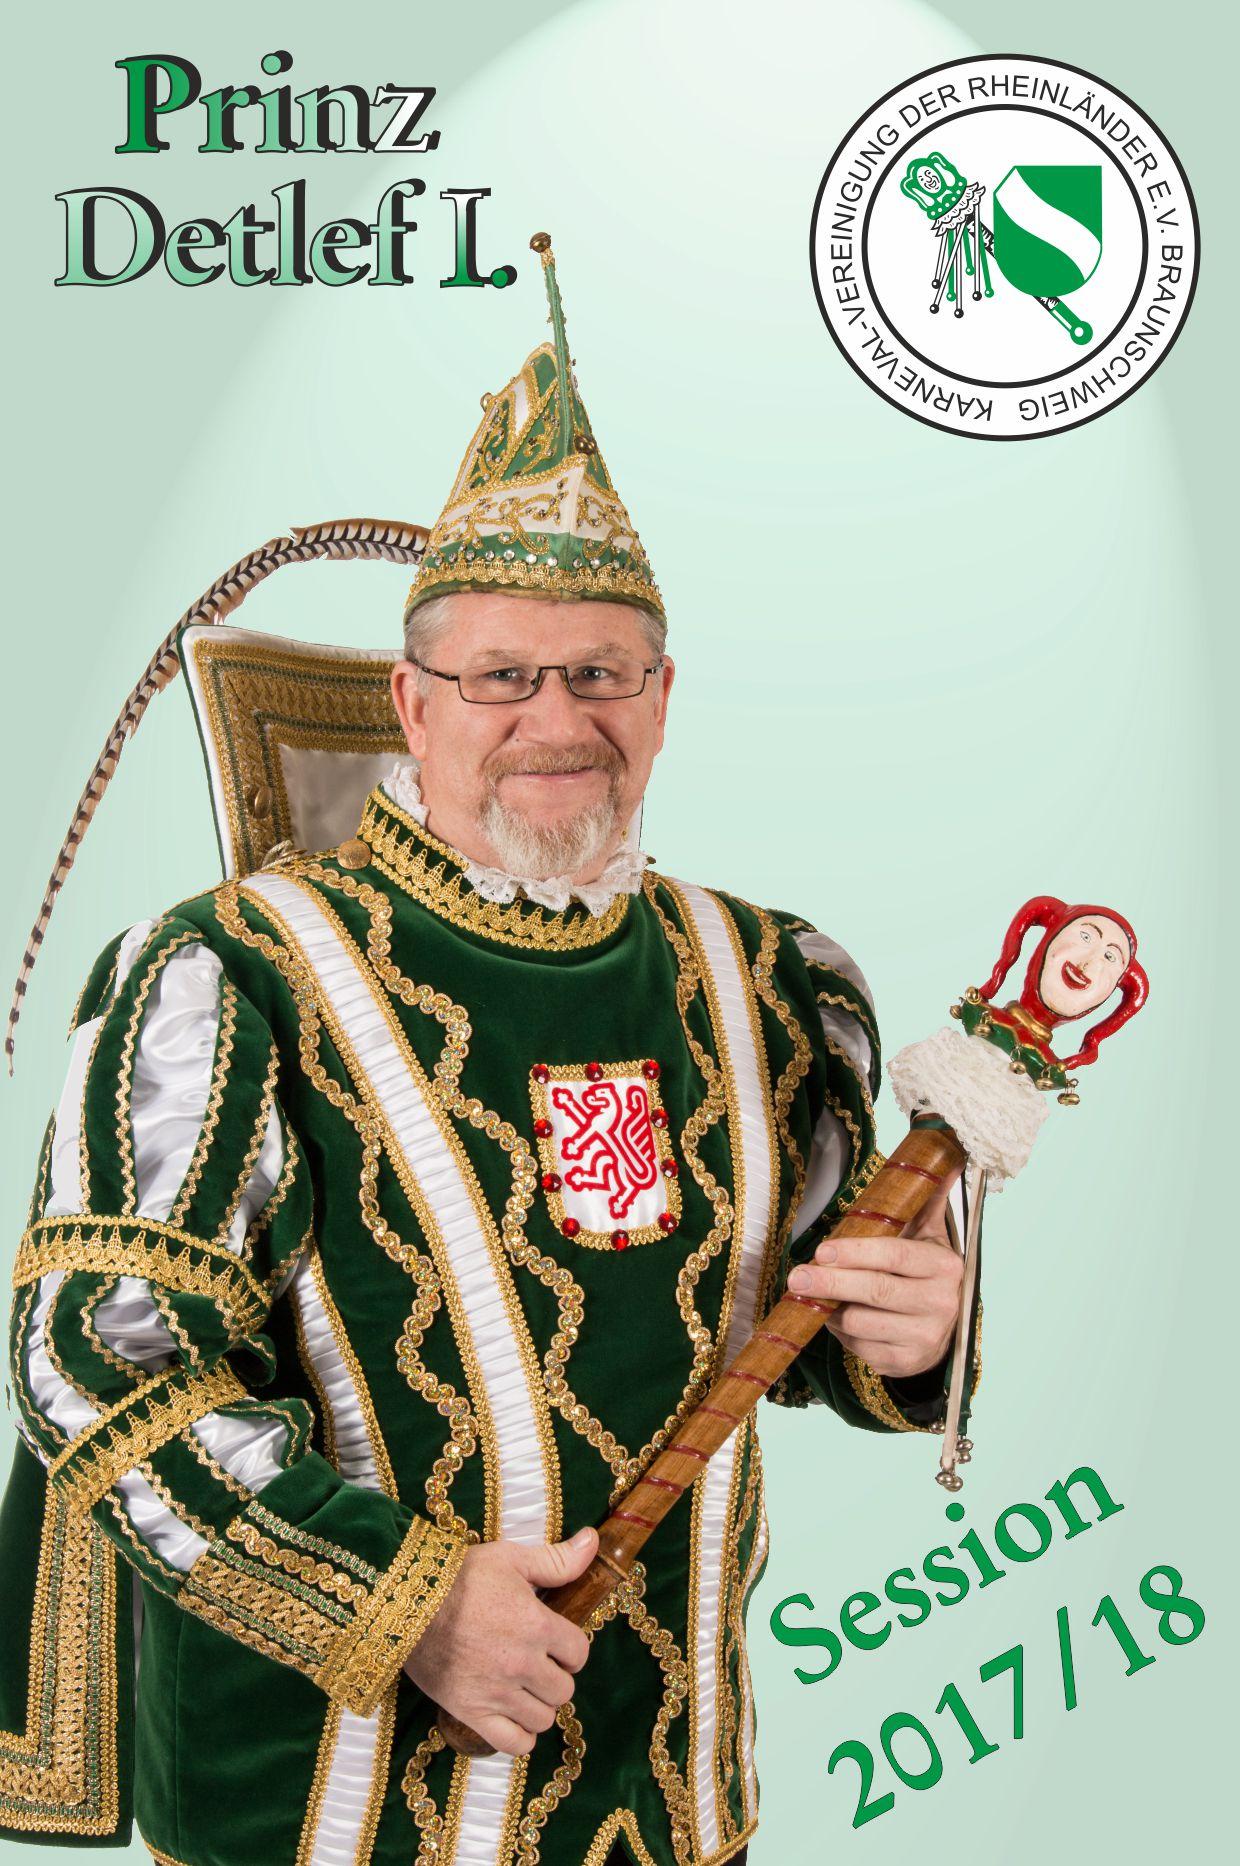 Prinz Detlef I. – Session 2017/18